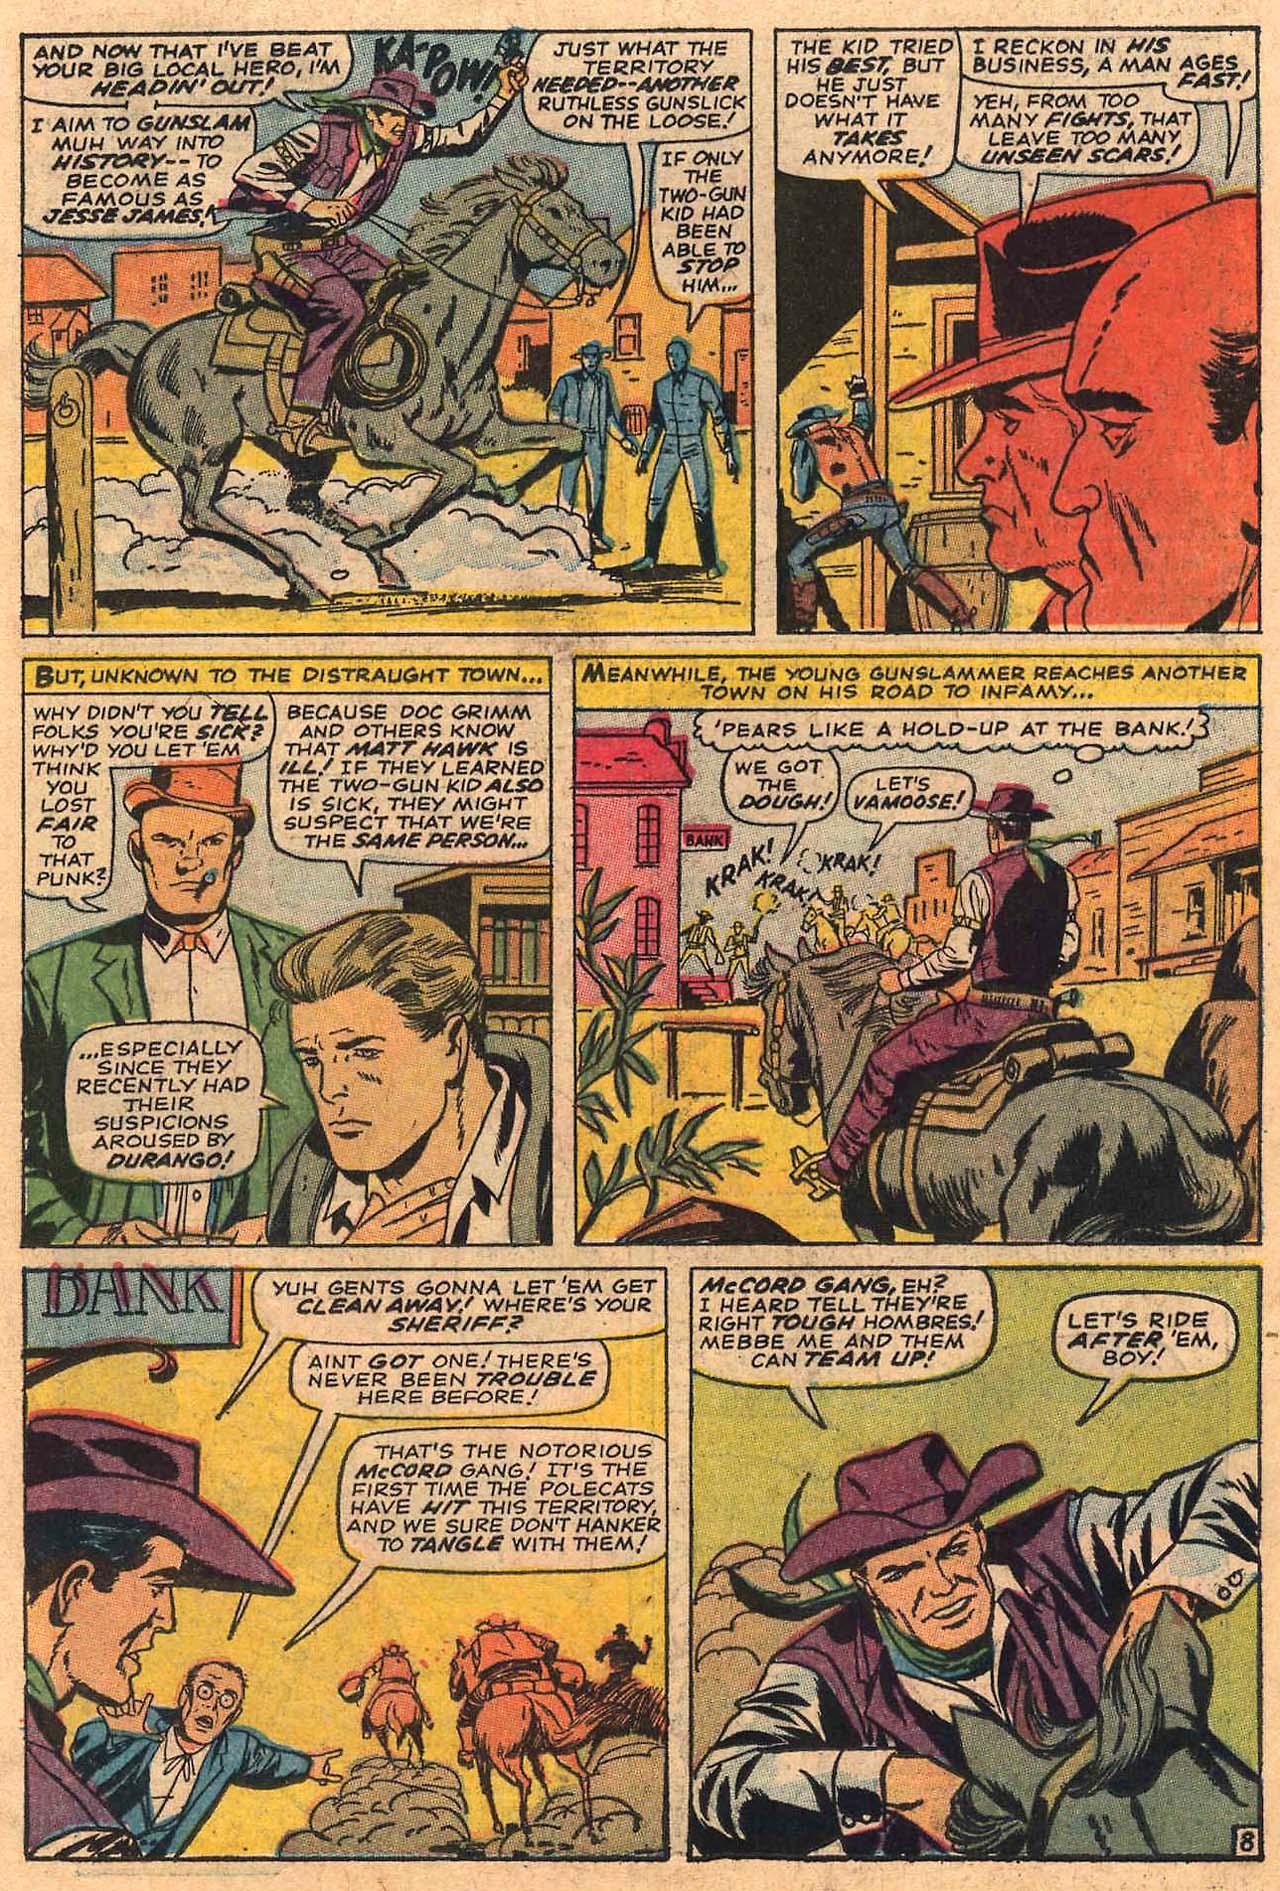 Read online Two-Gun Kid comic -  Issue #84 - 11